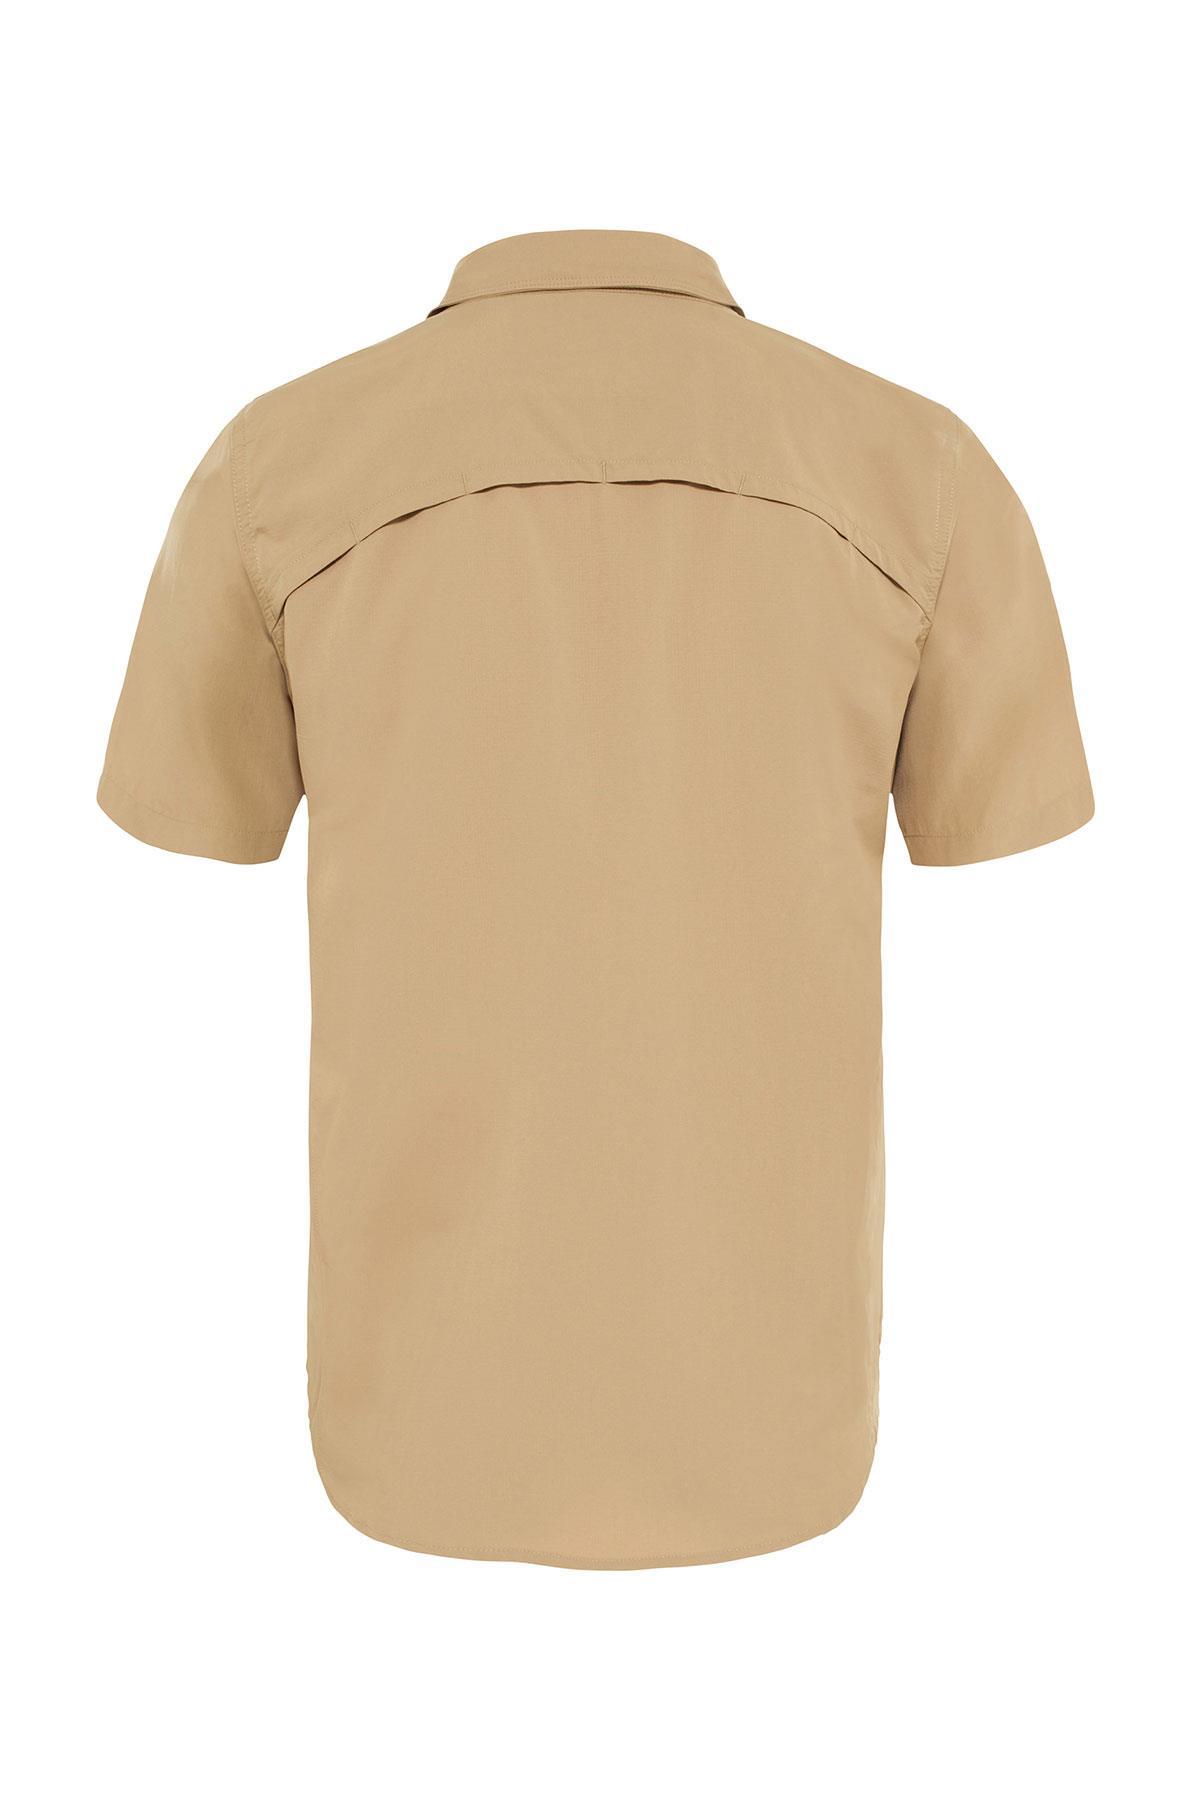 The Northface Erkek S/S Sequoia Shirt-Eu T92Xjxplx Gömlek